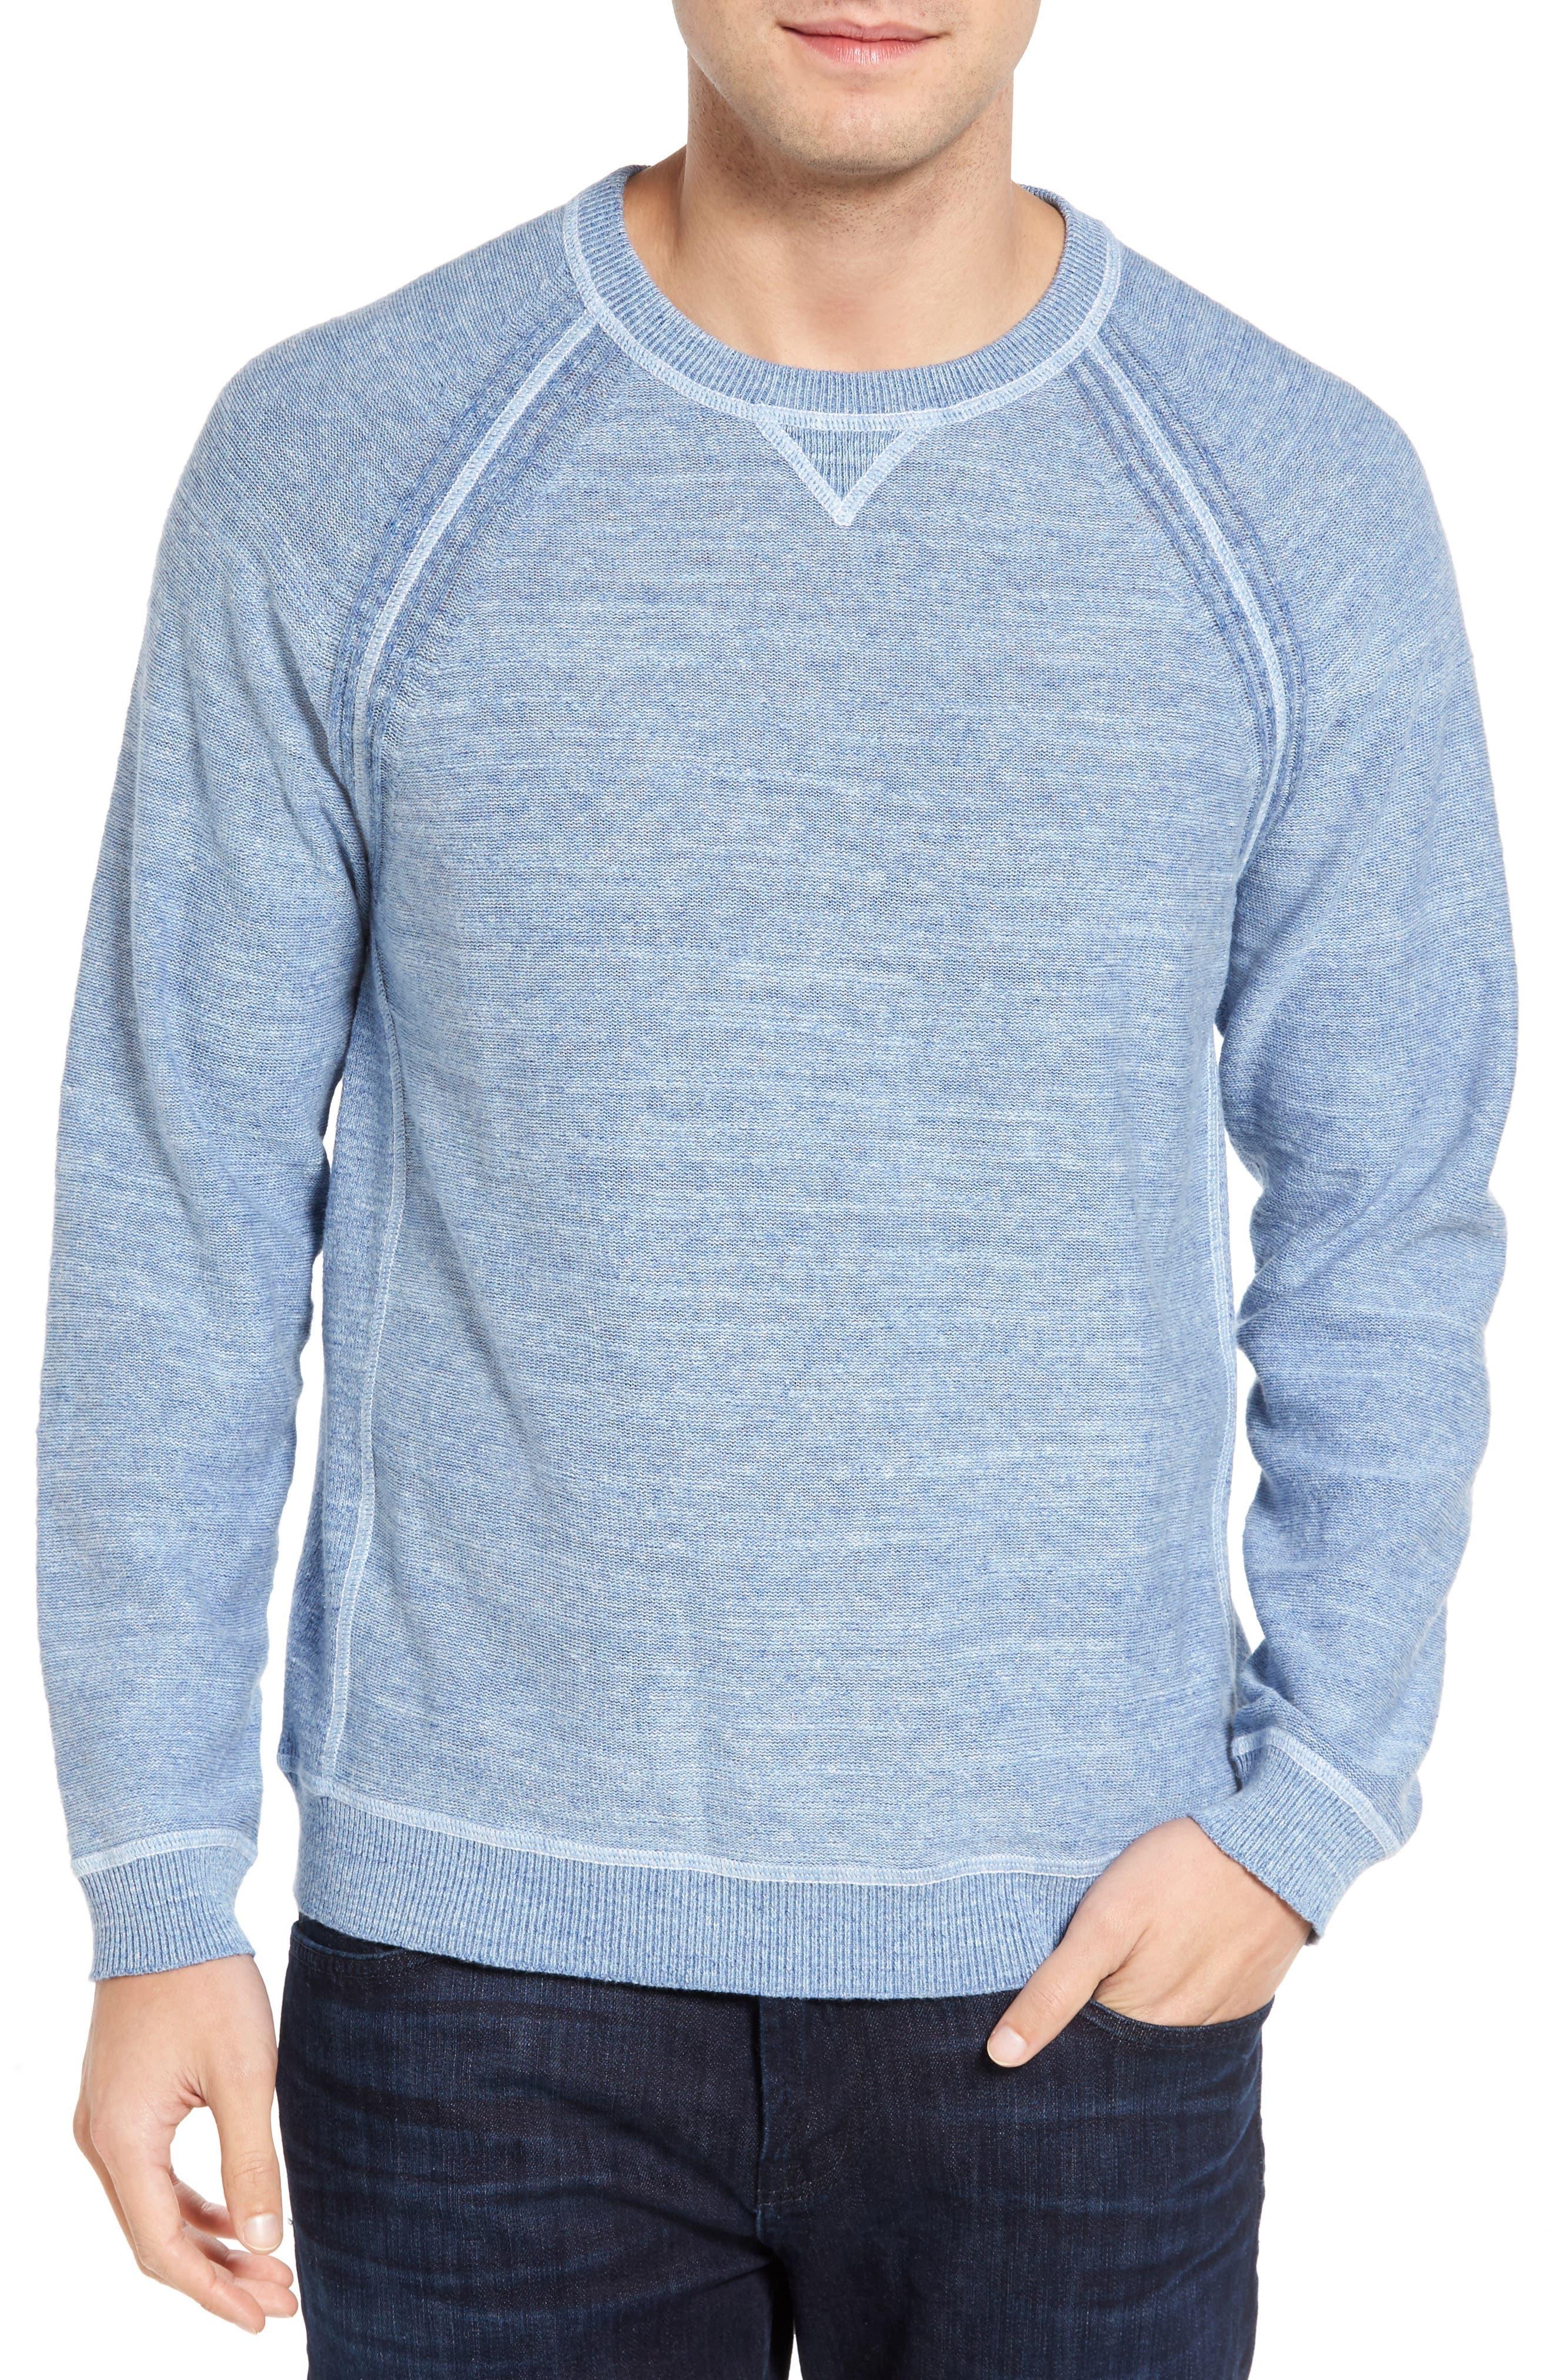 Tommy Bahama Sandy Bay Reversible Crewneck Sweater